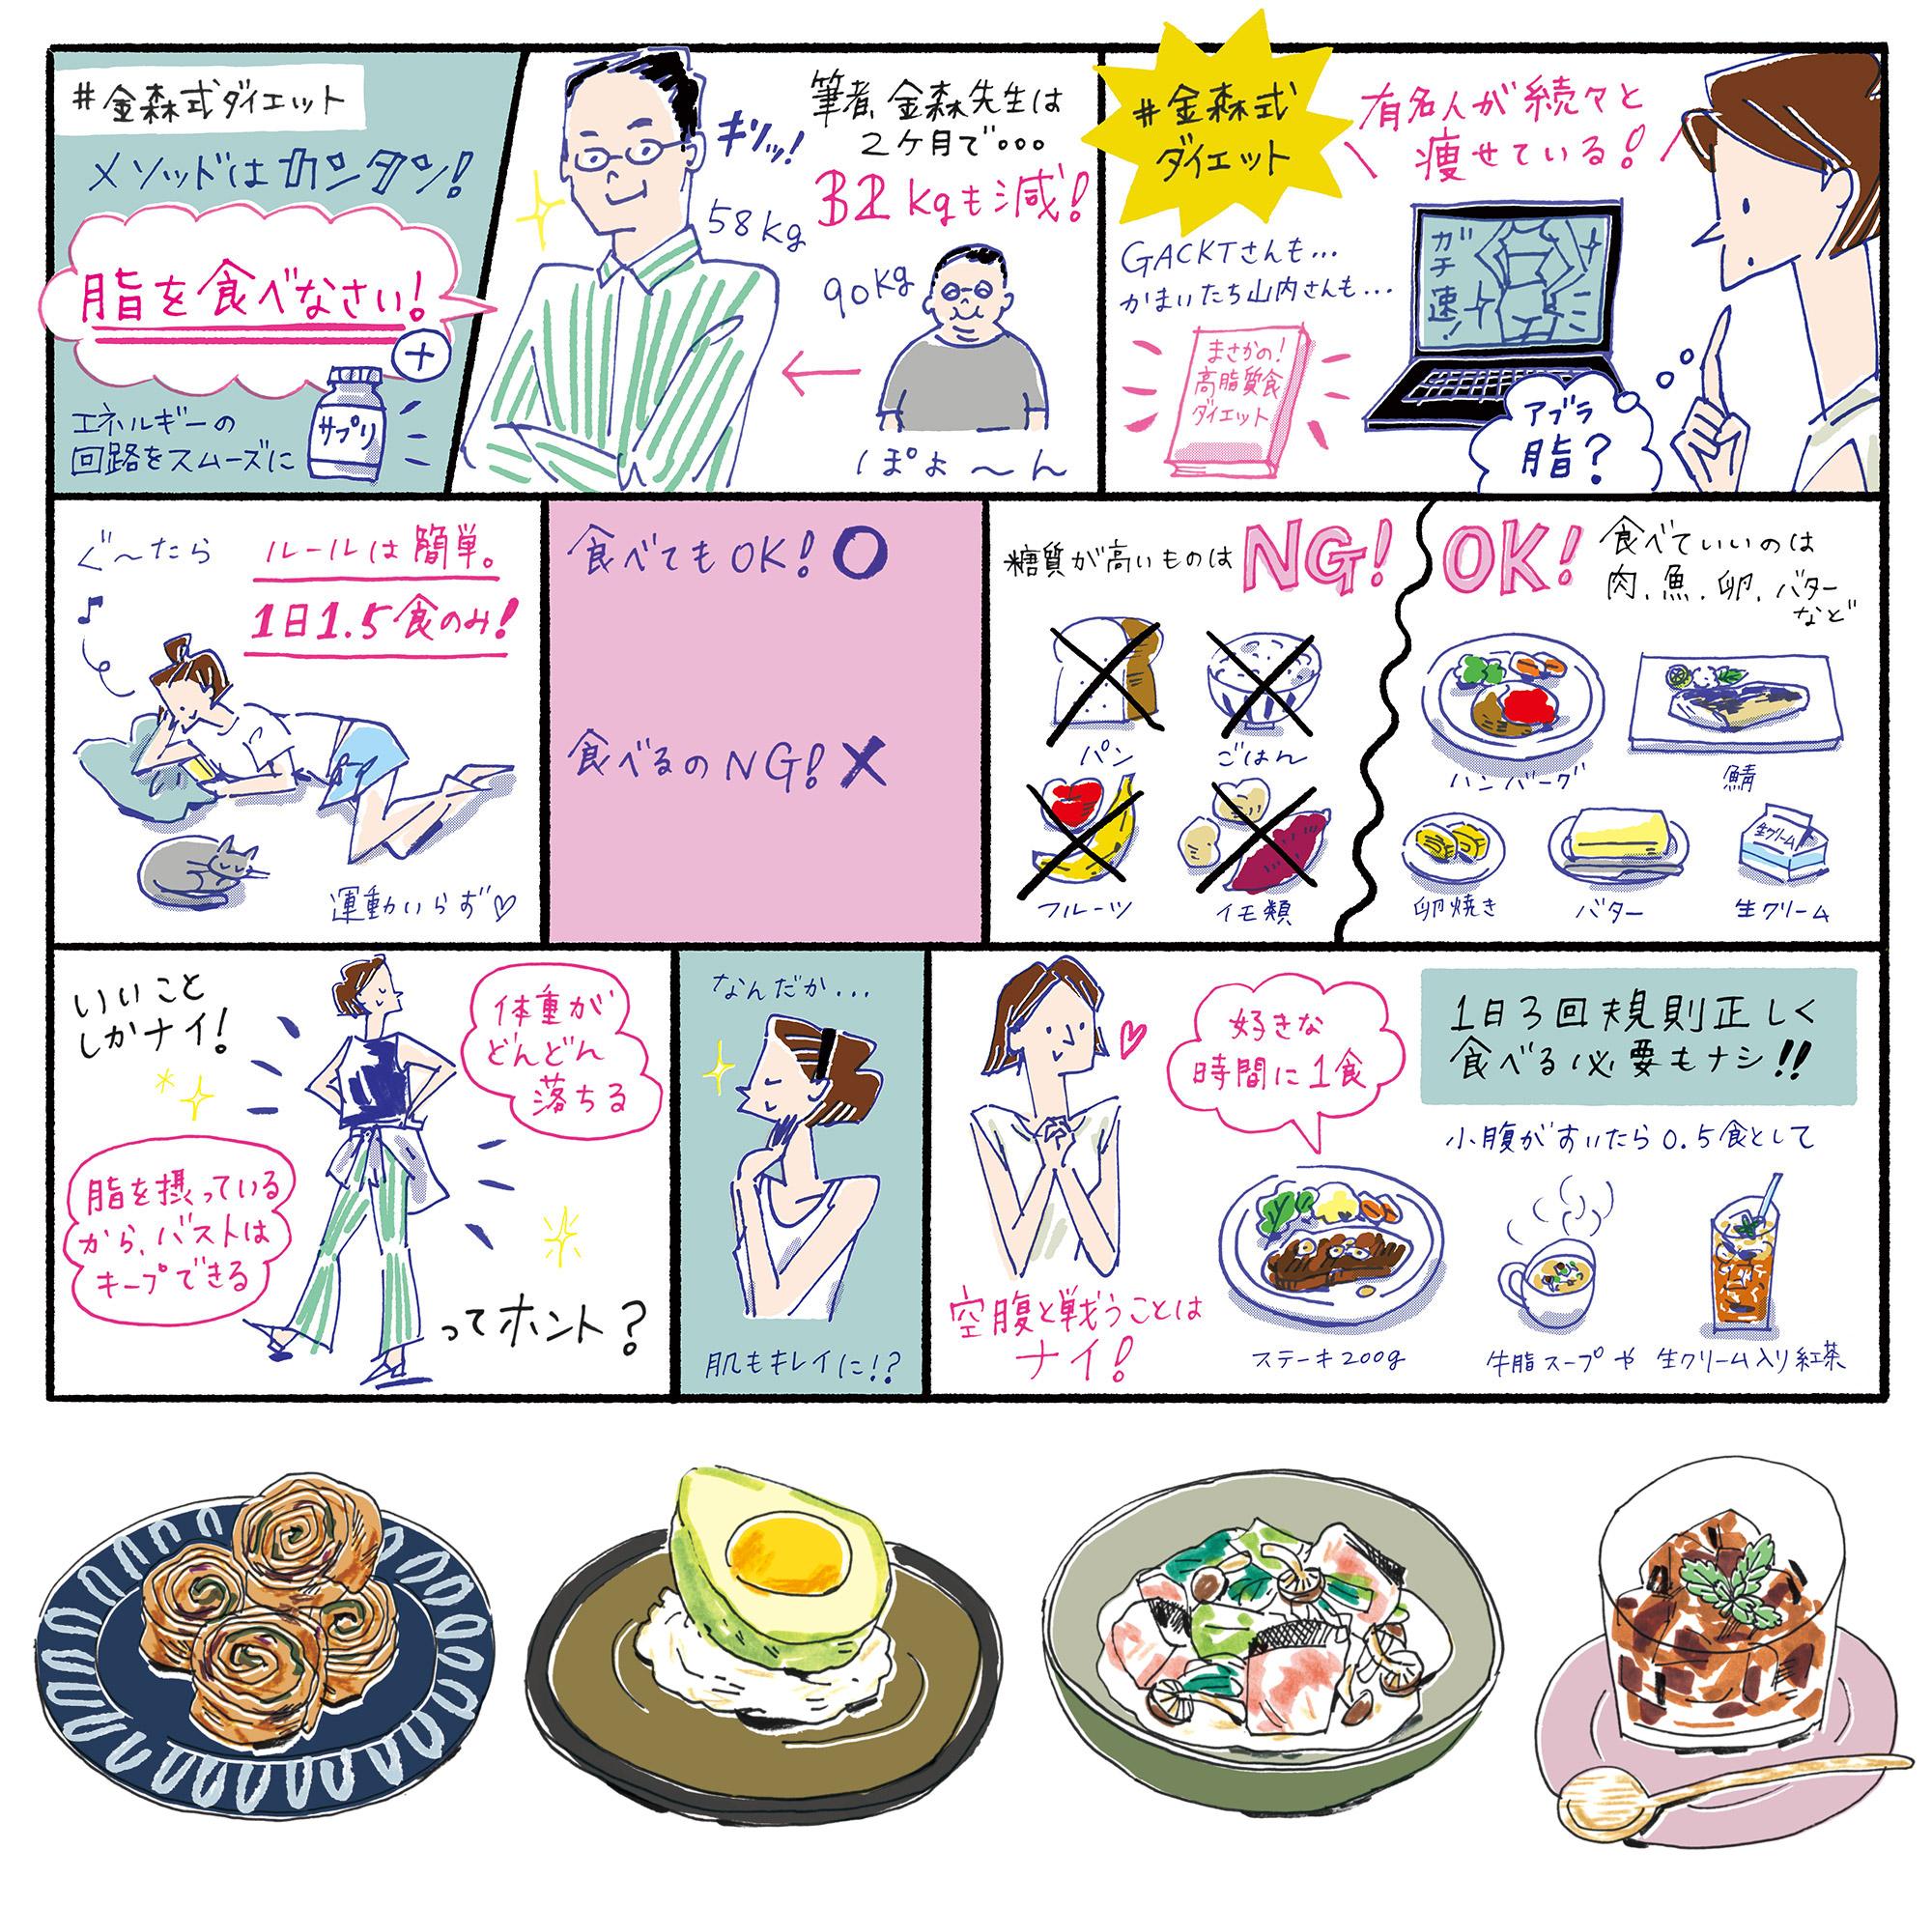 ChiakiMori_217